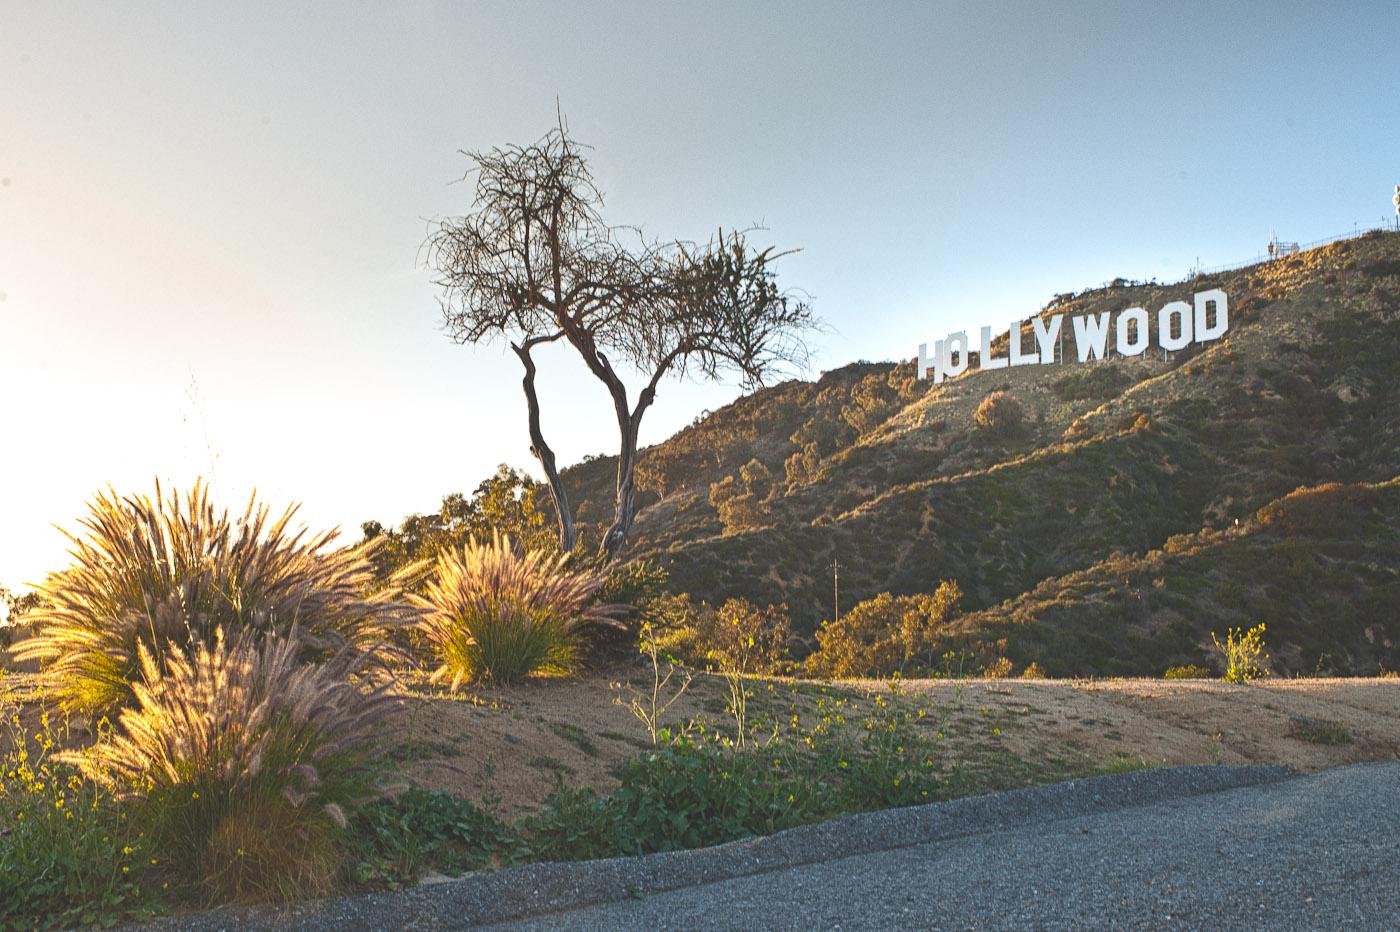 04 Hollywood Cute Actress Kristen Stewart Hd Wallpapers Photo Gallery 1400x932